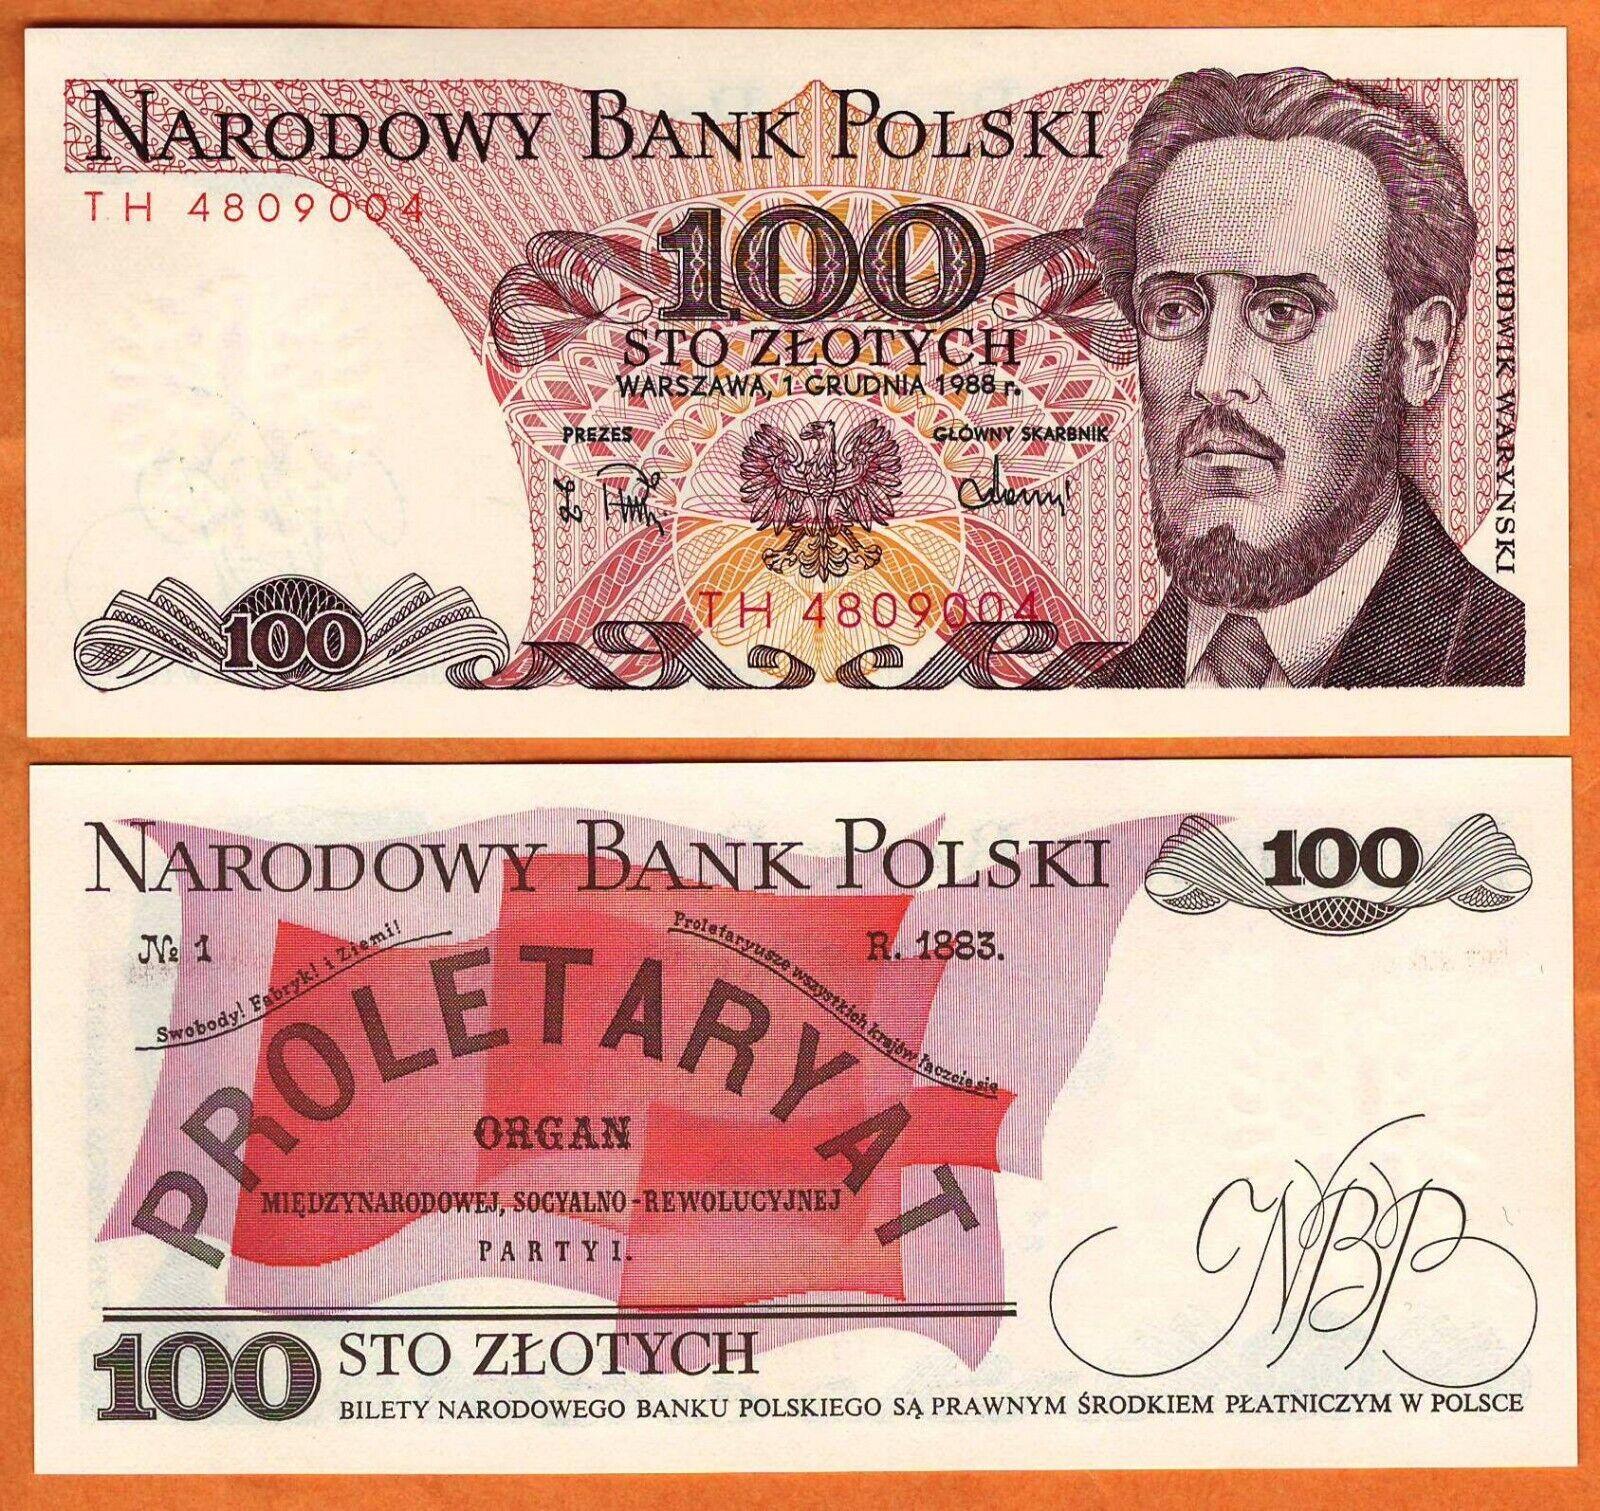 Poland 100 Zlotych 1988 P-143e Banknotes UNC